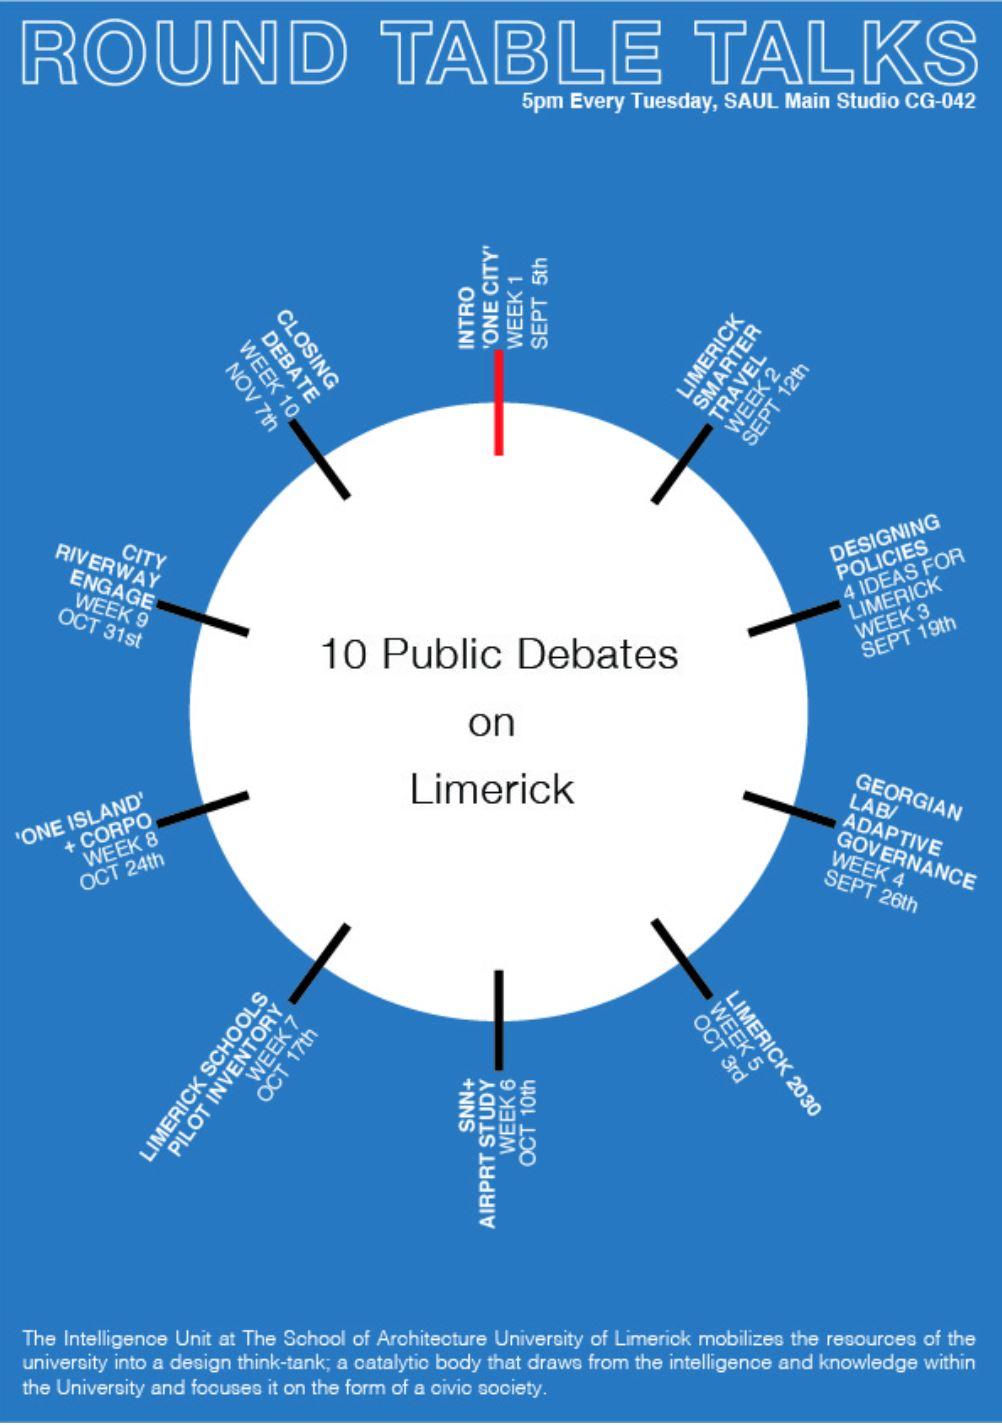 BA in Interior Design + Technology, LIT: Roundtable Talks ...